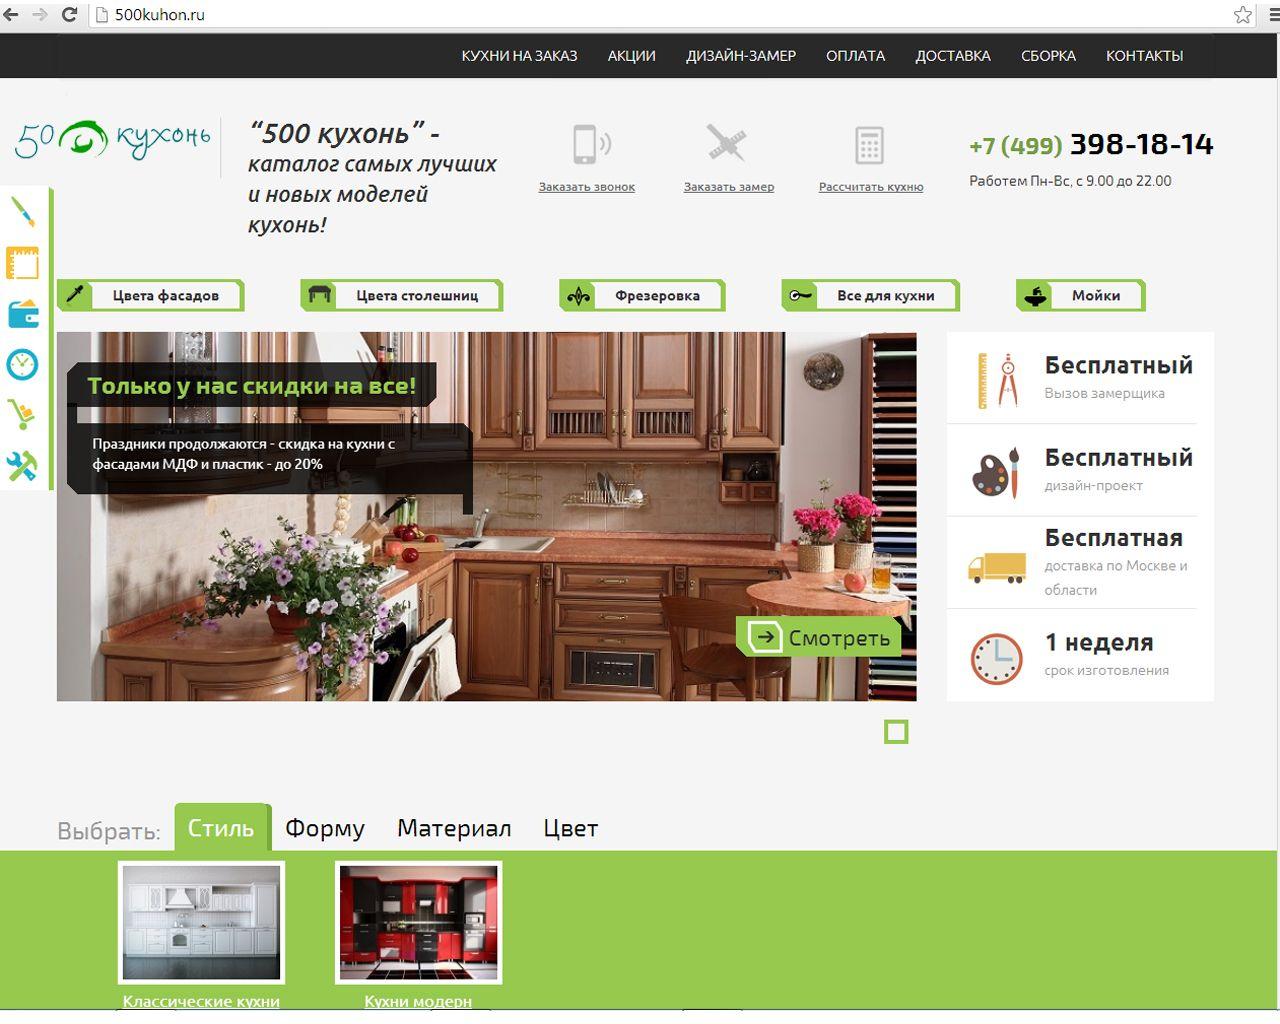 Логотип для интернет каталога кухонь - дизайнер BeSSpaloFF